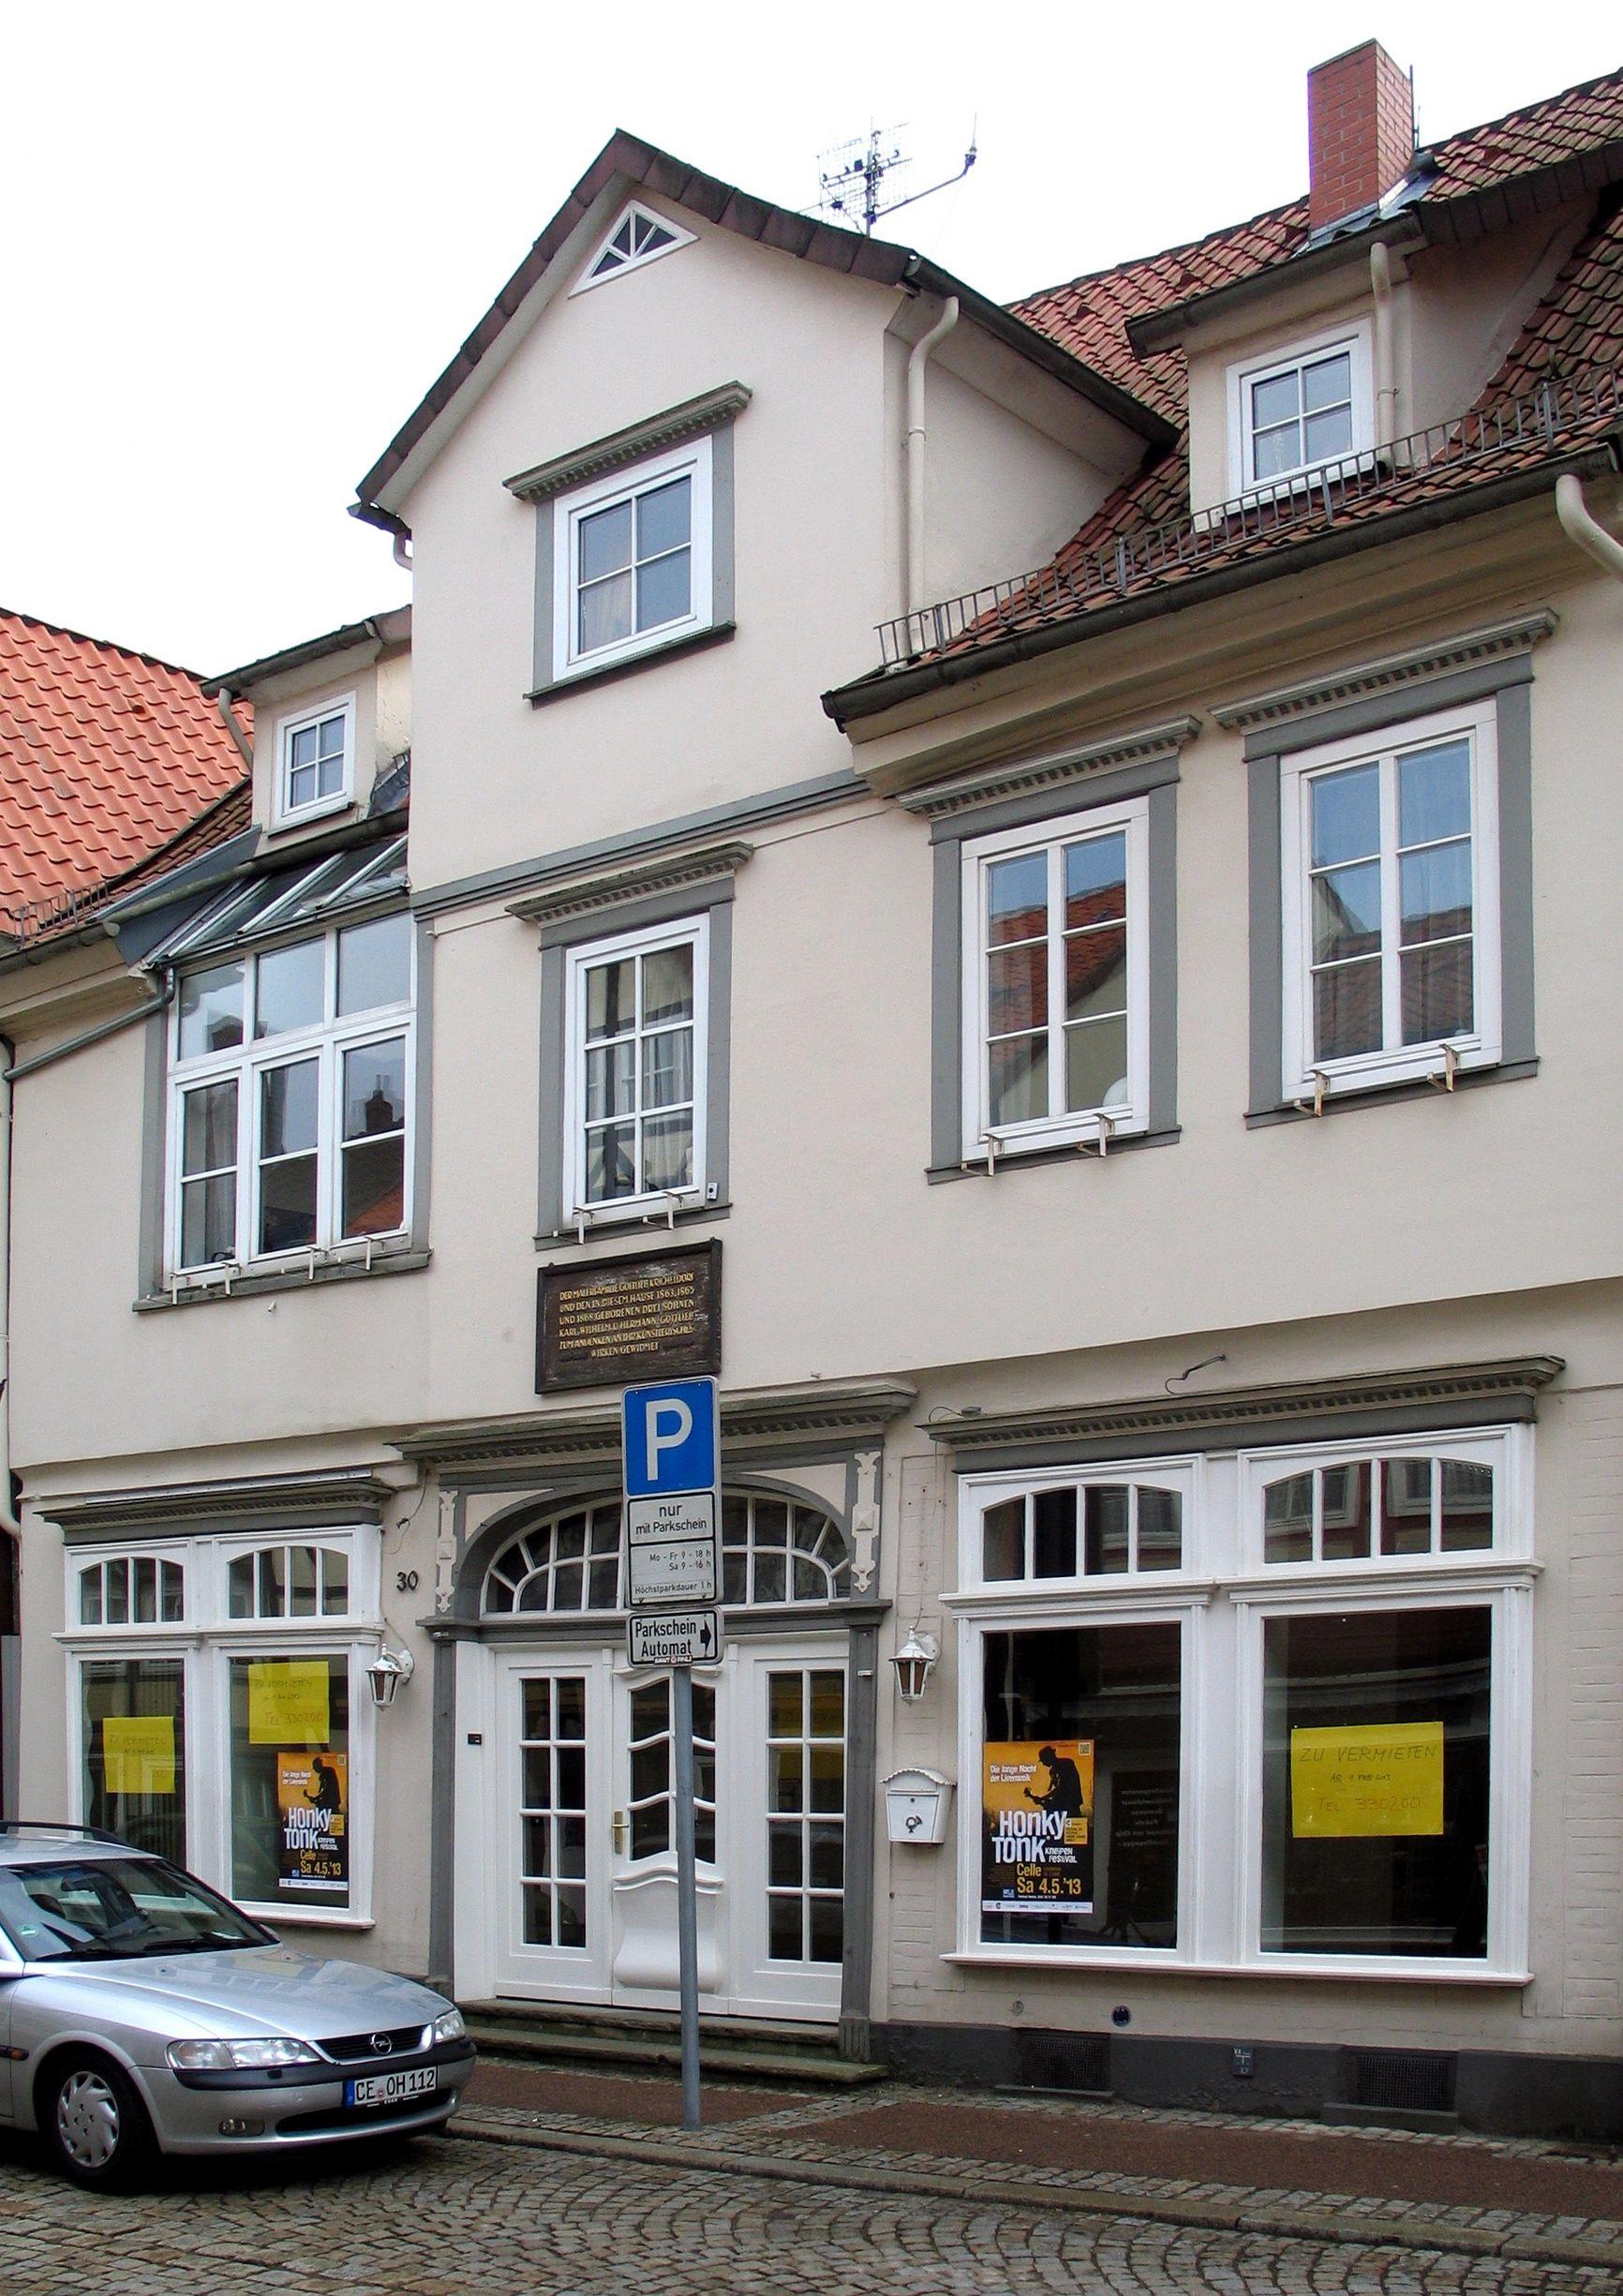 Maler Celle file bergstraße 30 celle hier wohnte die malerfamilie gottfried